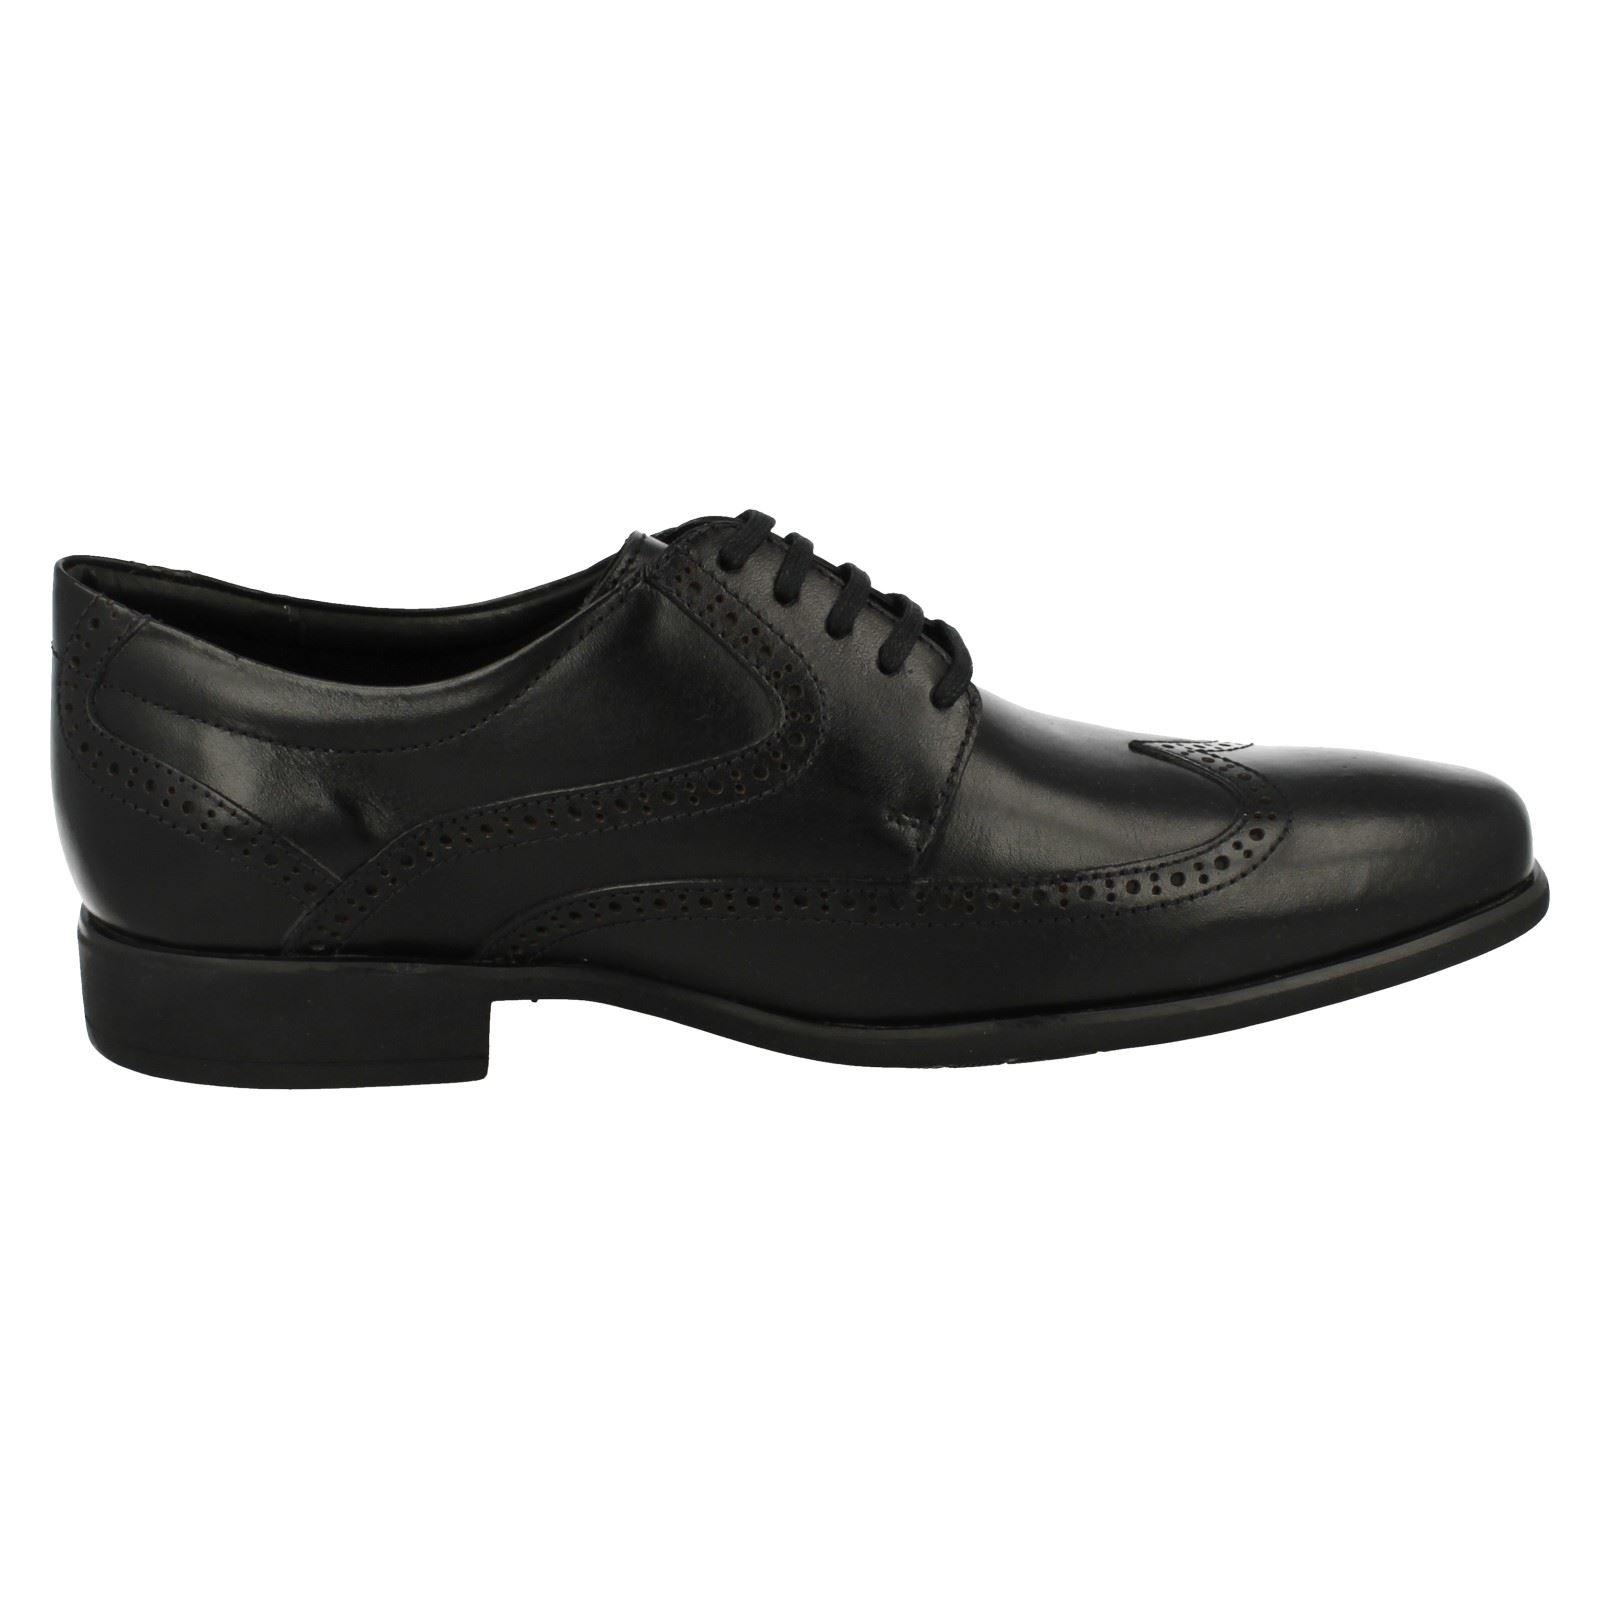 Herren Schuhes Anatomic Smart Formal Schuhes Herren 'Panapolis' 40c3ab